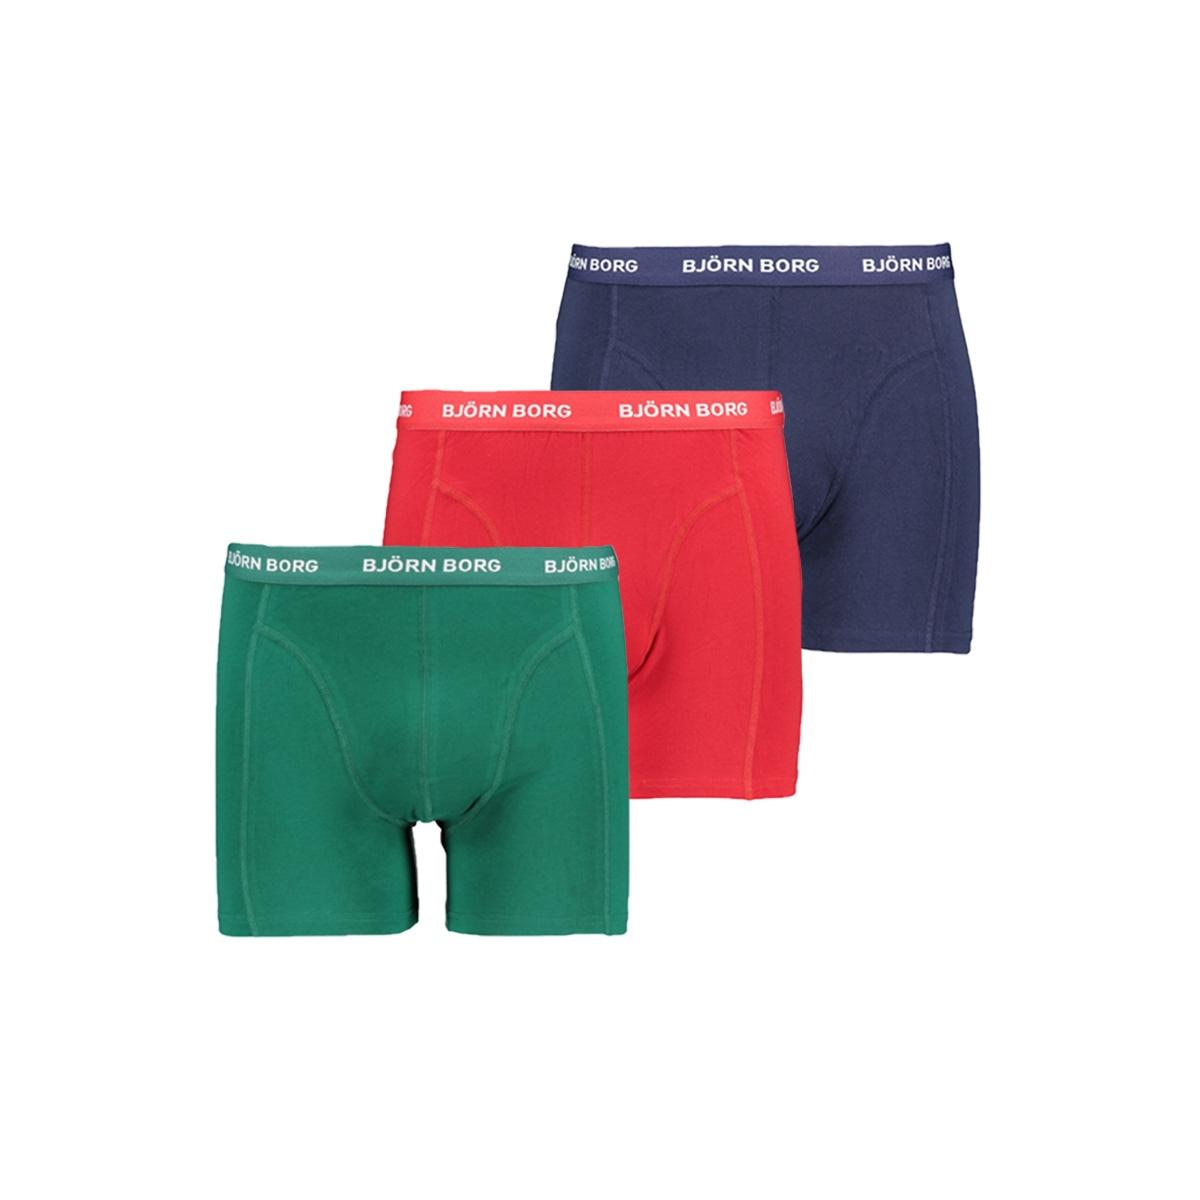 shorts sammy solid 2031 1396 bjorn borg ondergoed 80781 evergreen